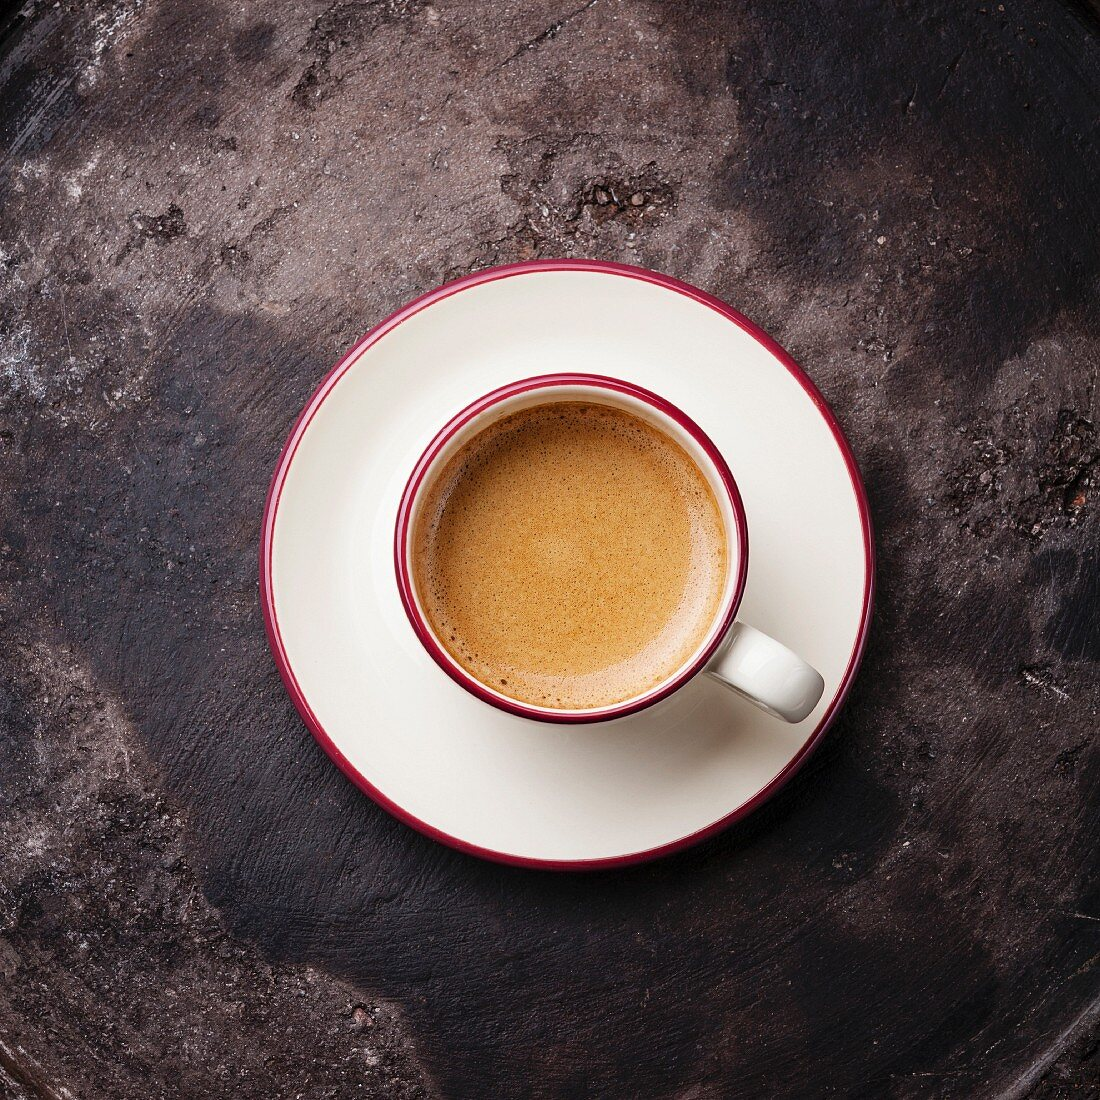 Coffee cup on dark textured background